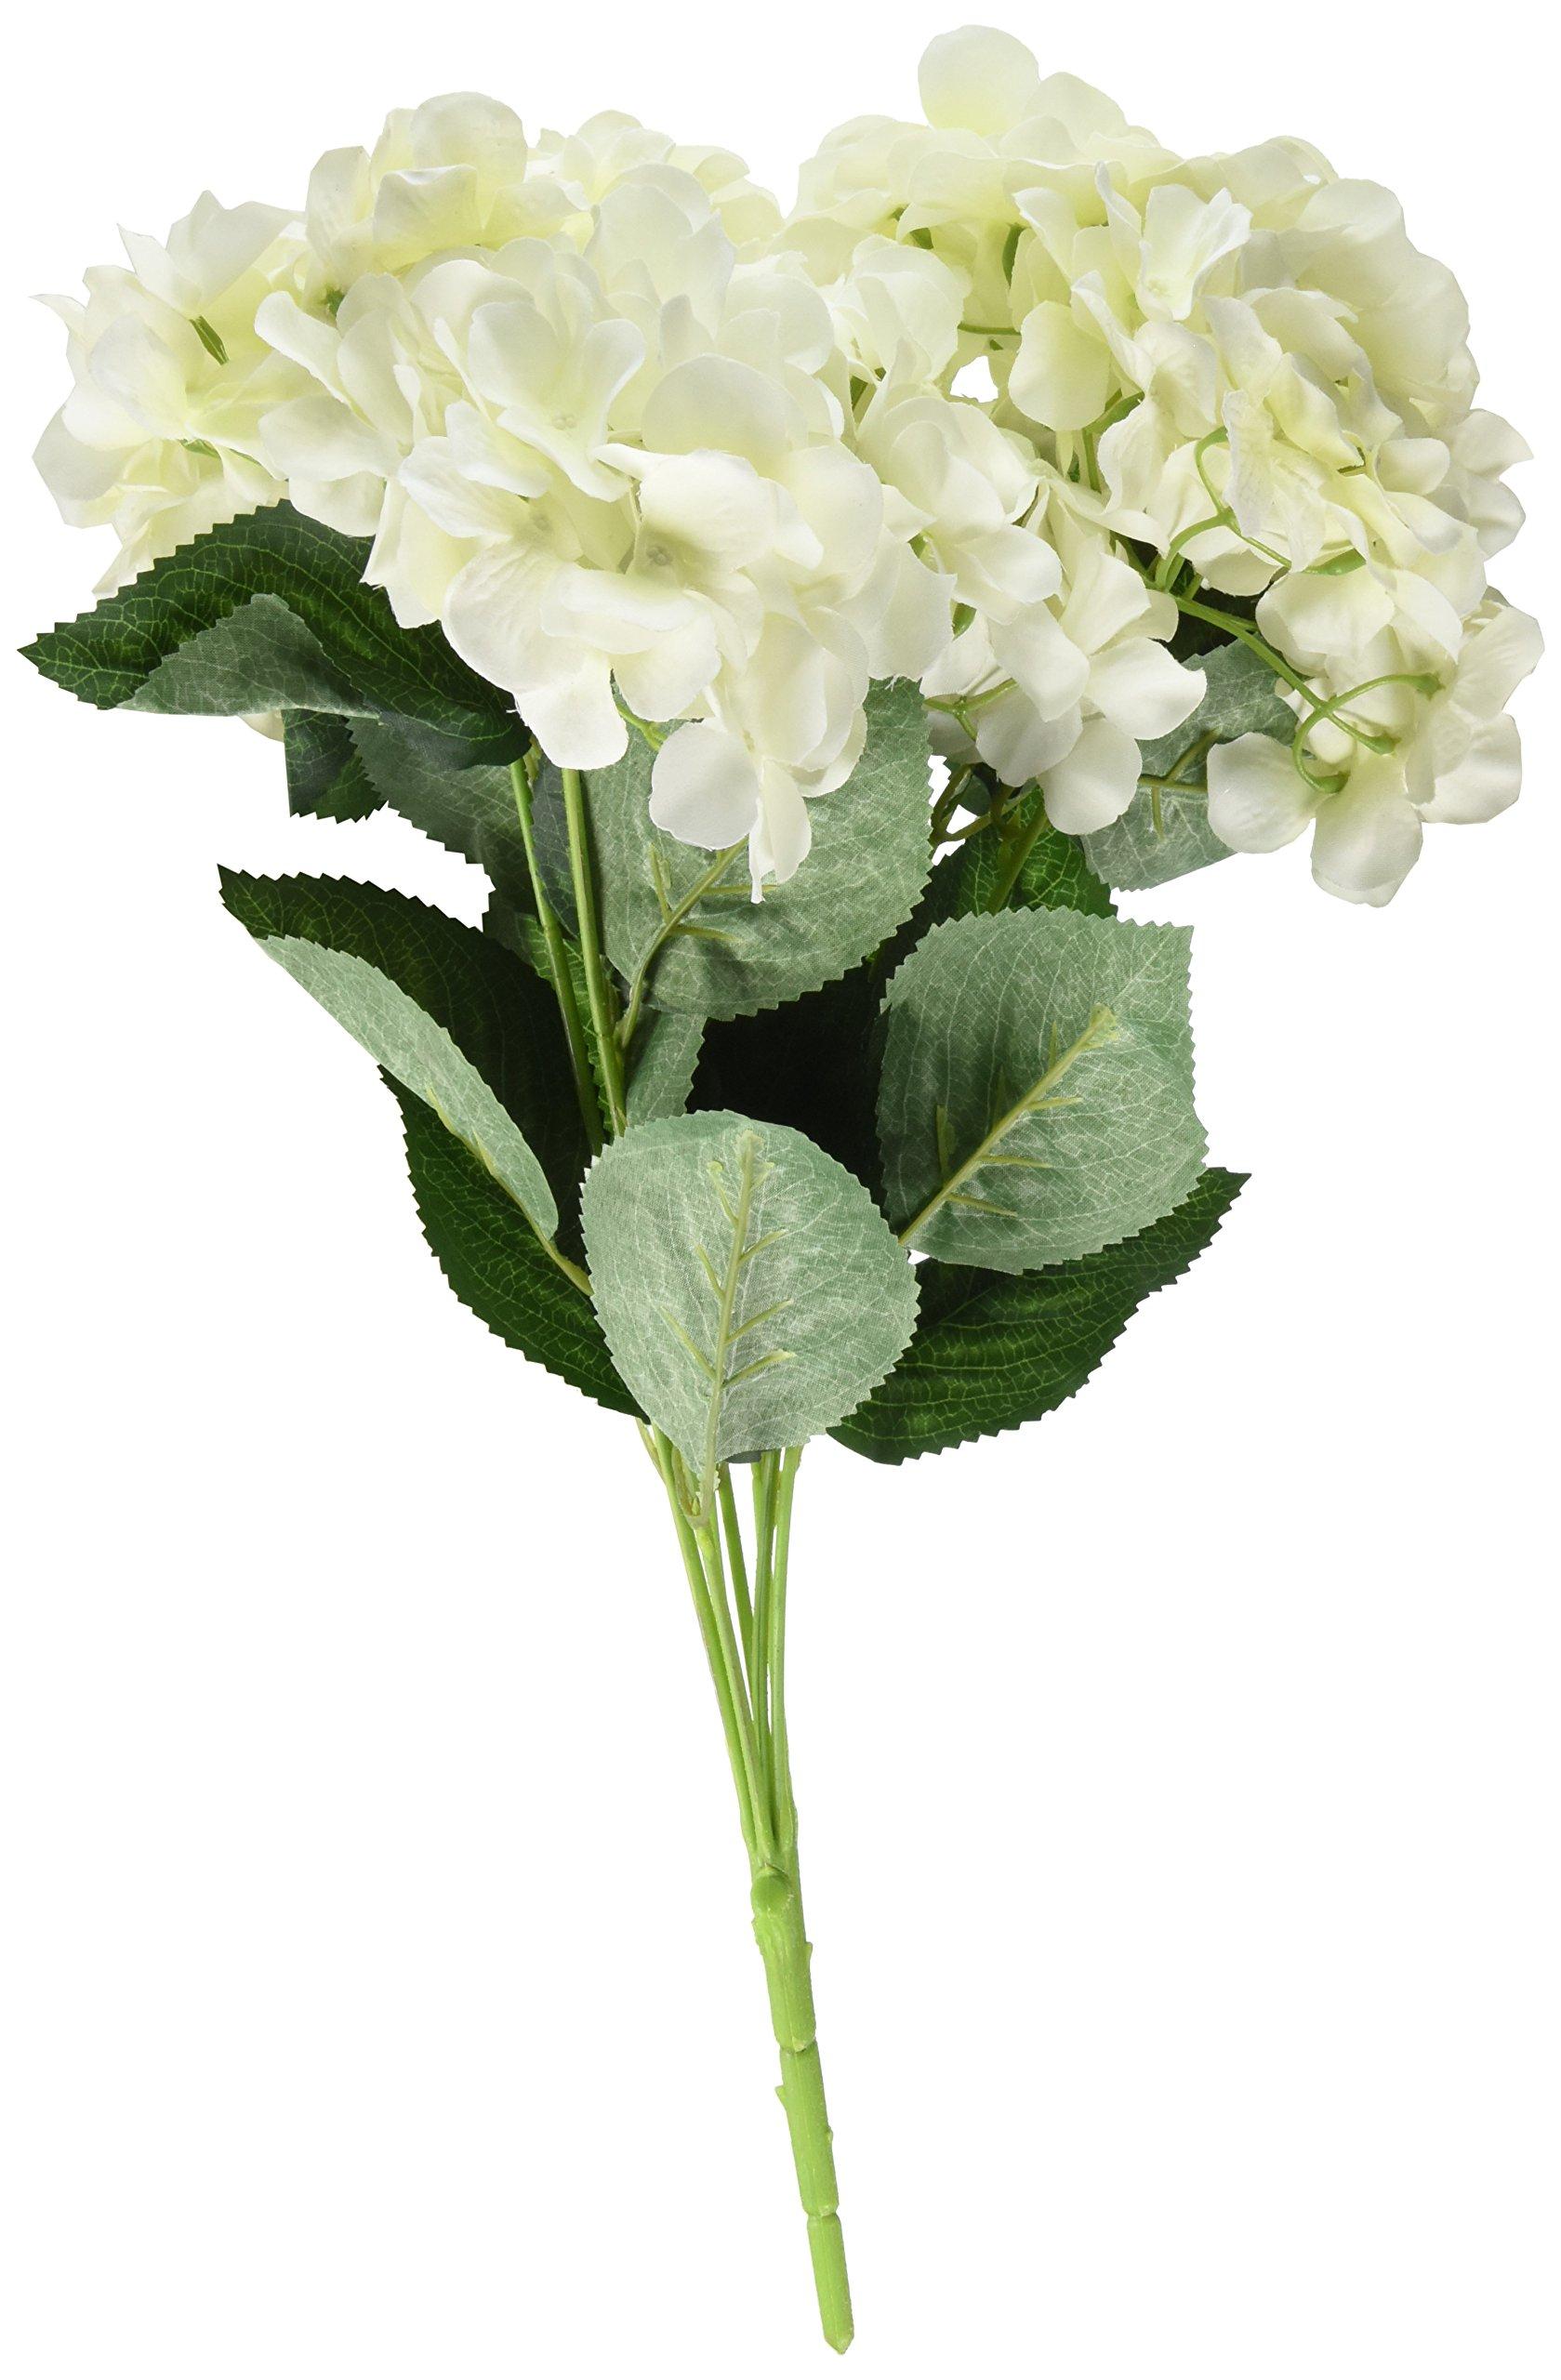 YSBER-3-Big-Heads-Artificial-Hydrangea-Silk-Fake-Flowers-Bunch-Bouquet-Home-Hotel-Wedding-Party-Centerpieces-Garden-Floral-Decor